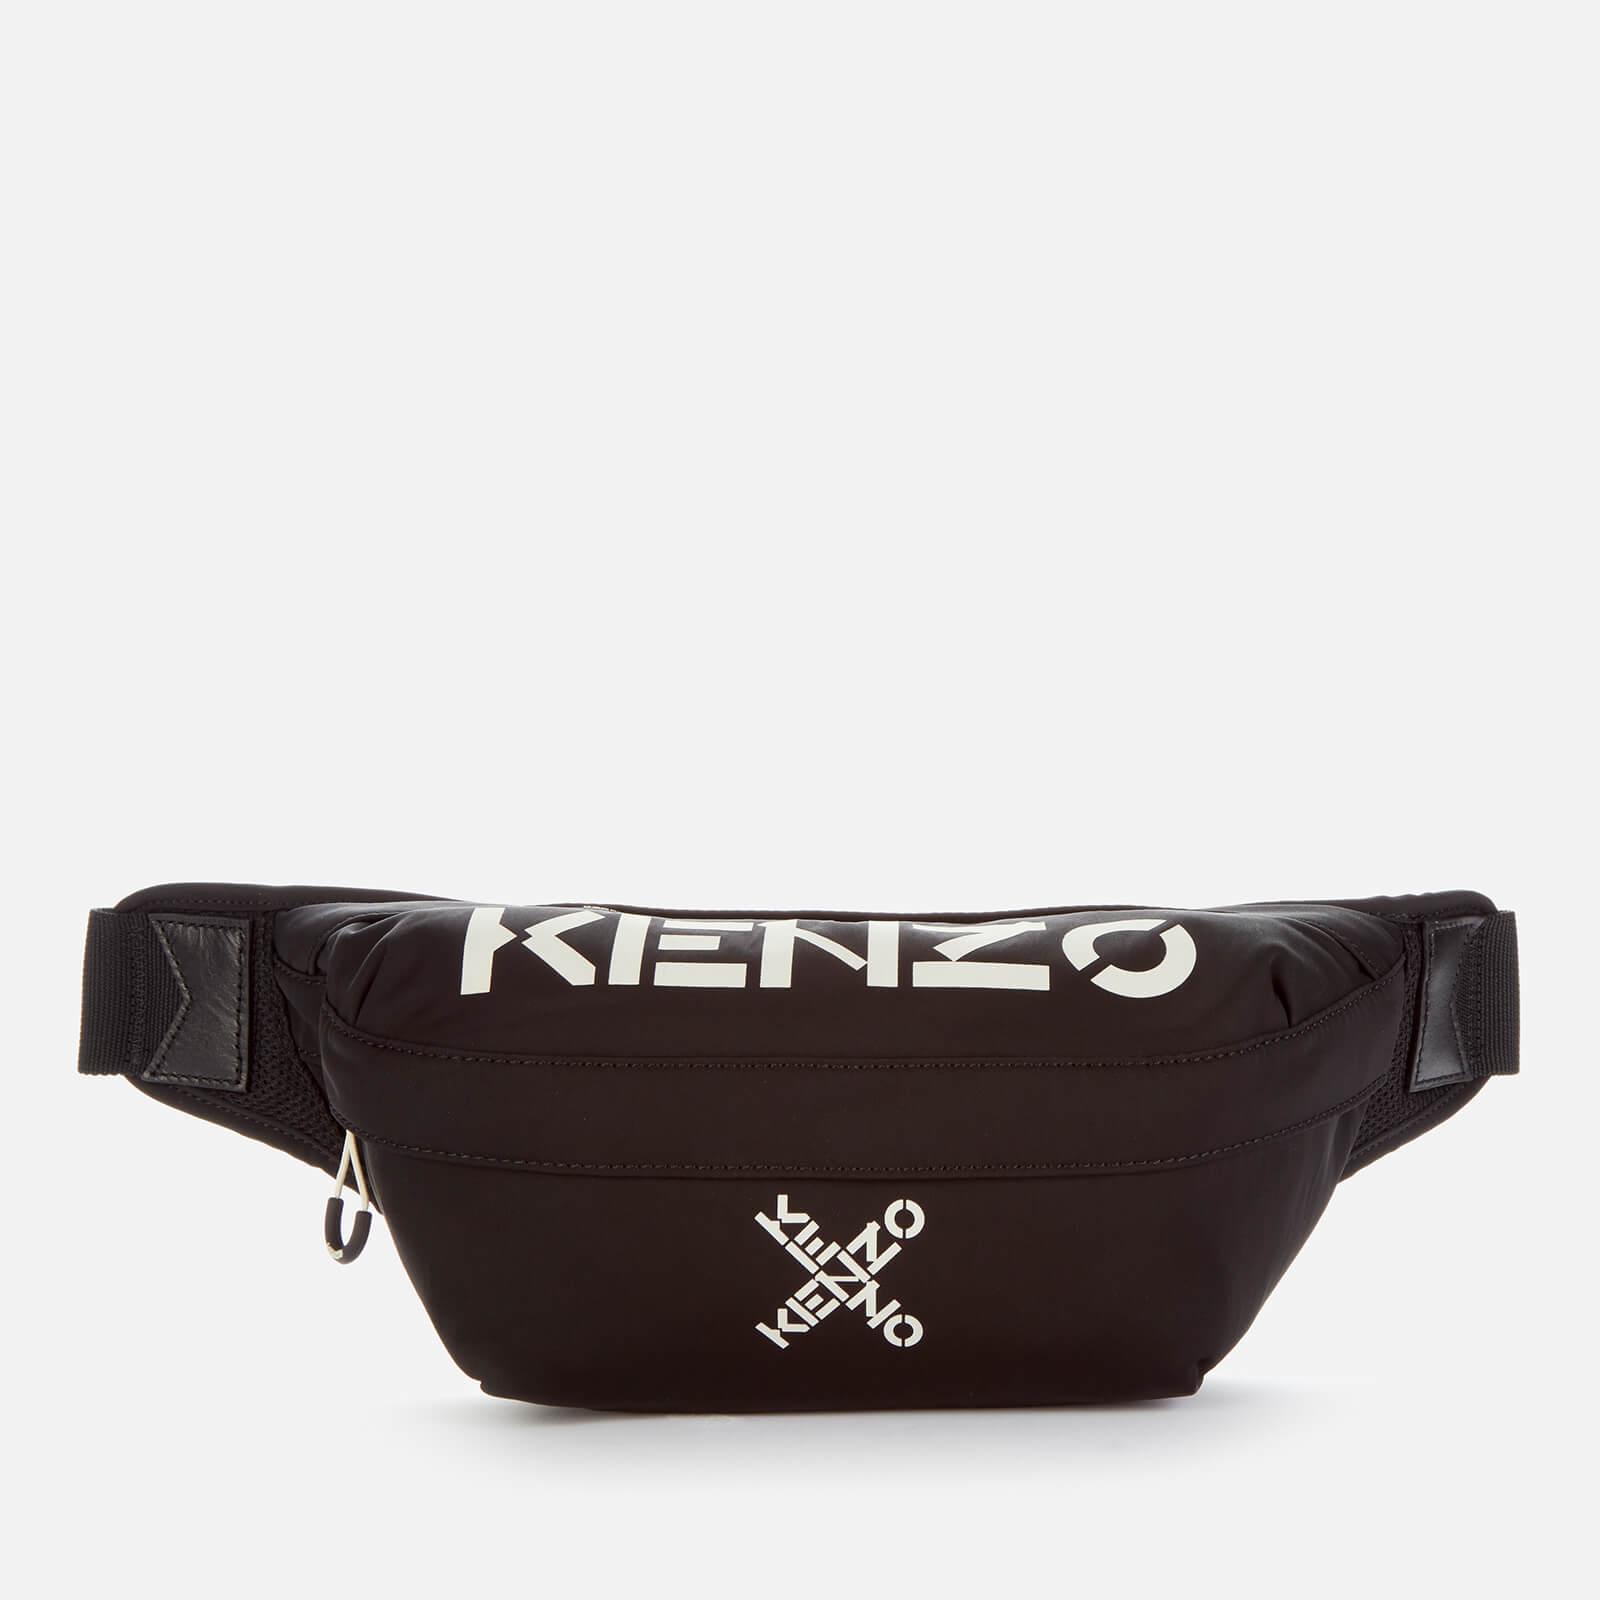 KENZO Men's Sport Belt Bag - Black